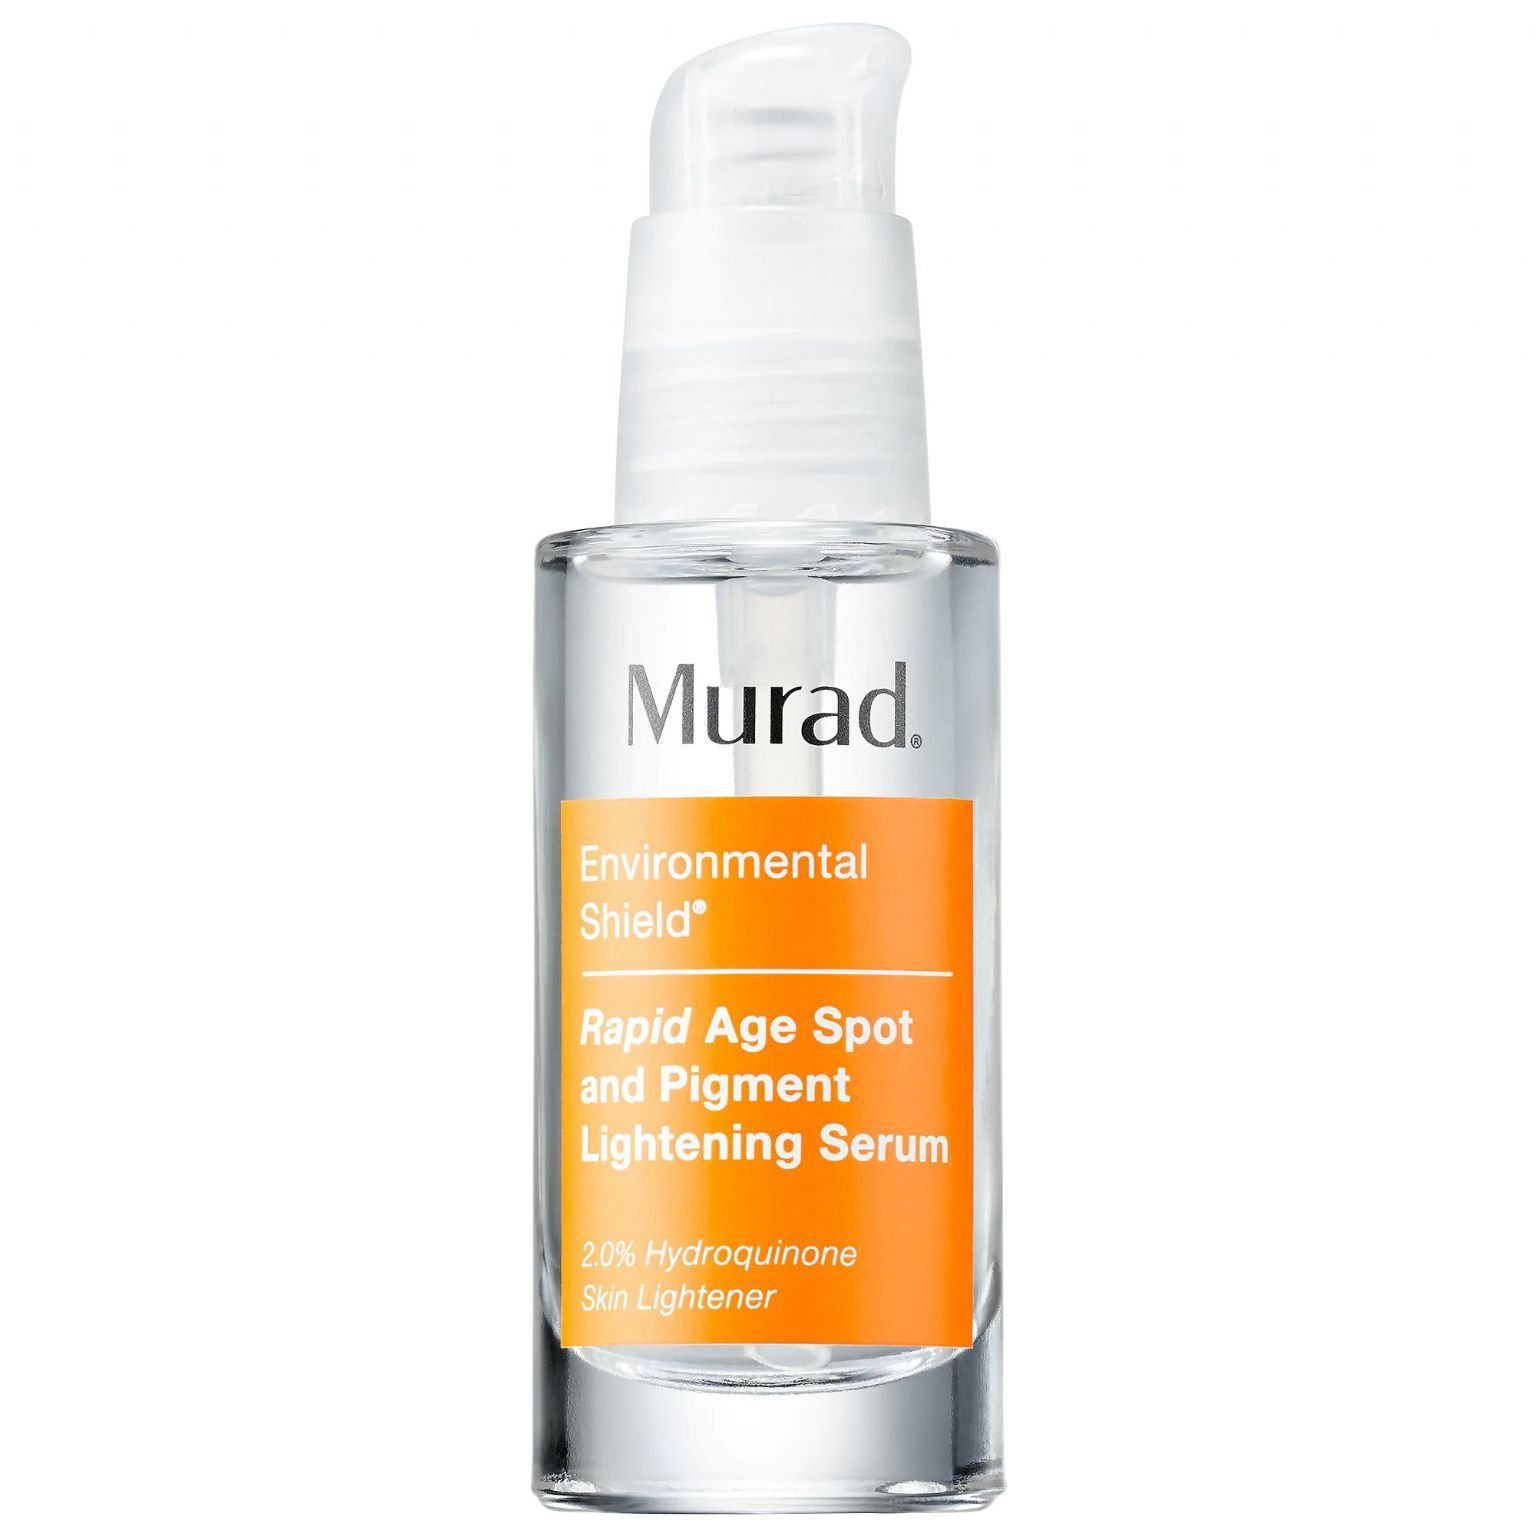 Environmental Shield Rapid Age Spot and Pigment Lightening Serum